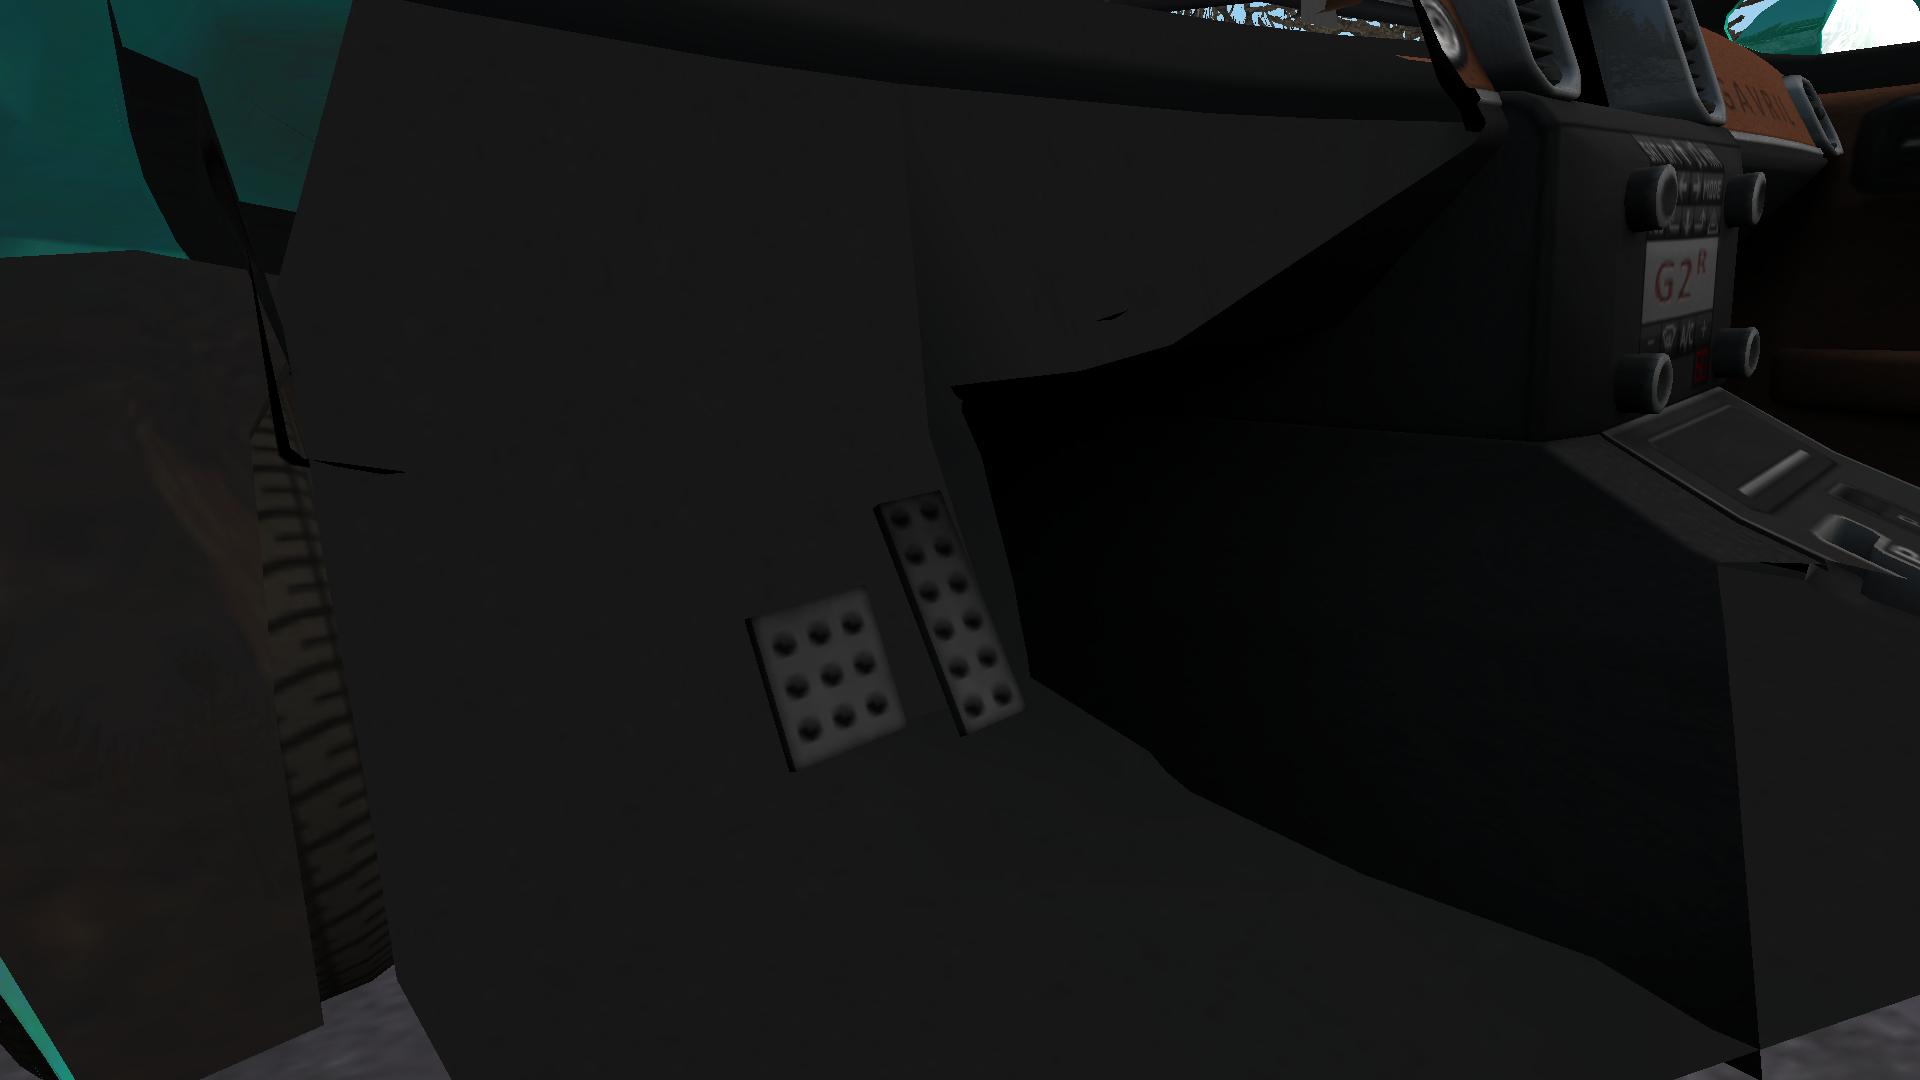 screenshot_2021-06-17_10-51-30_1.png